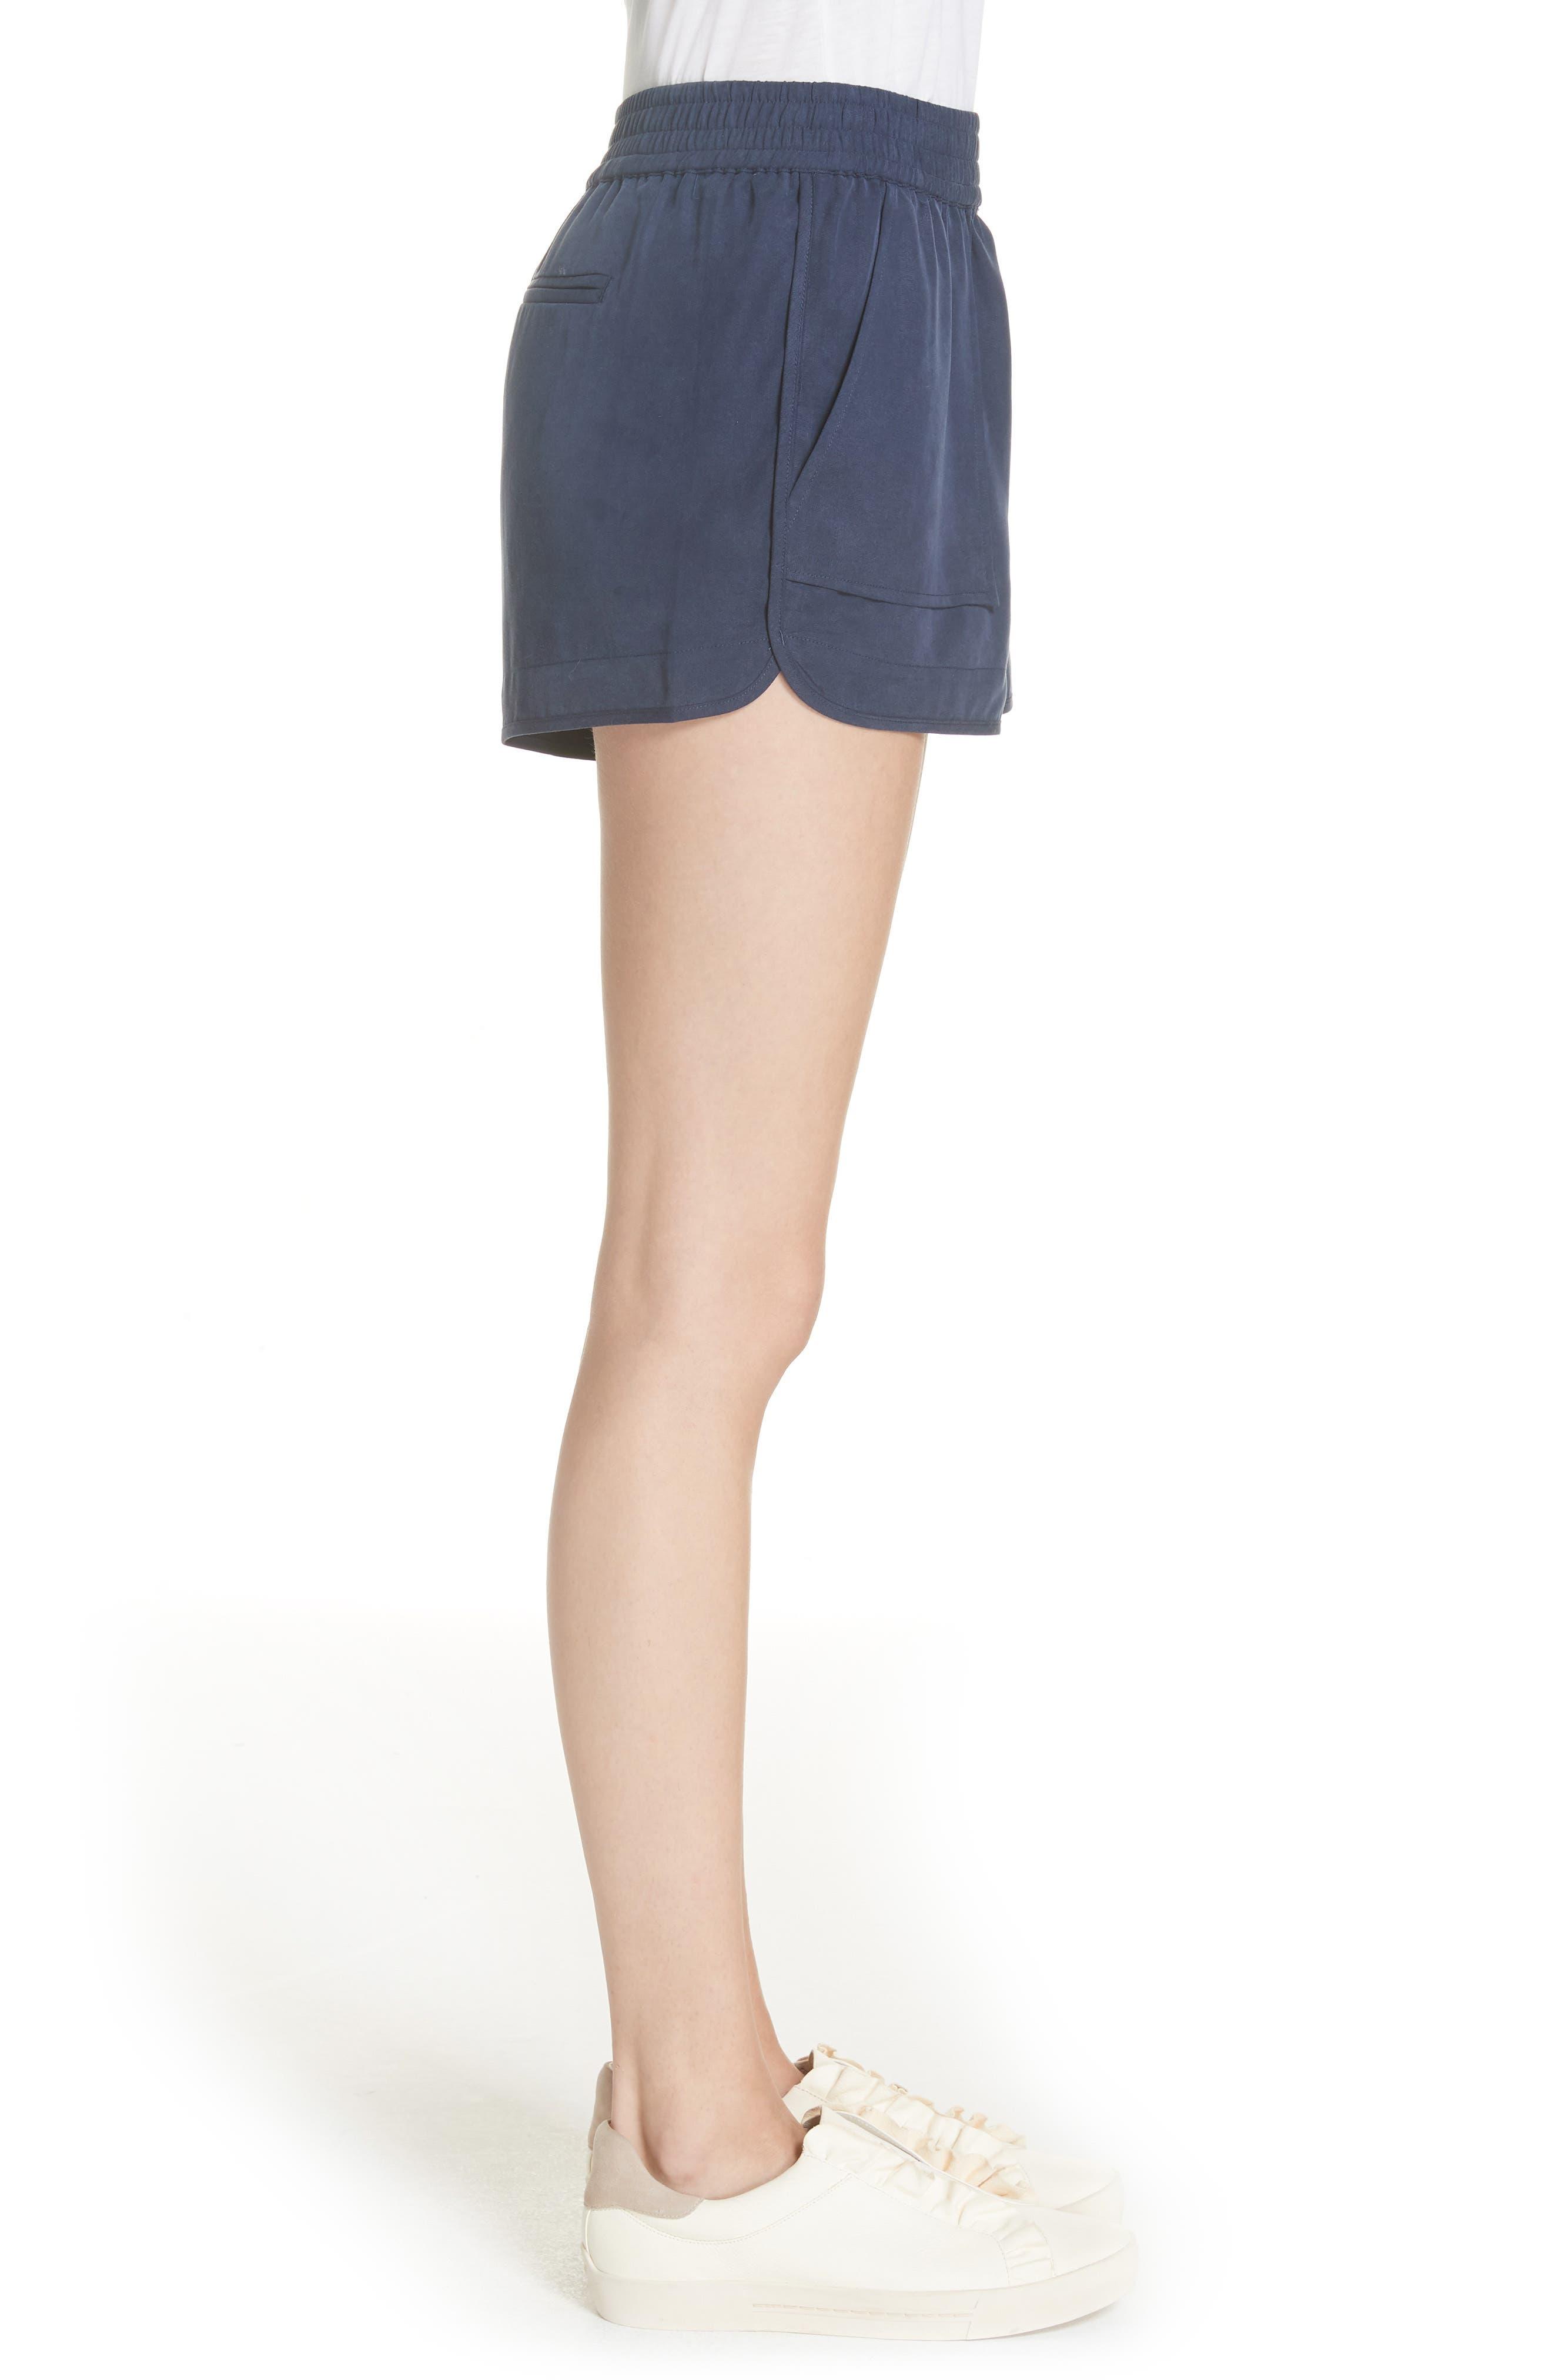 Beso Shorts,                             Alternate thumbnail 3, color,                             418